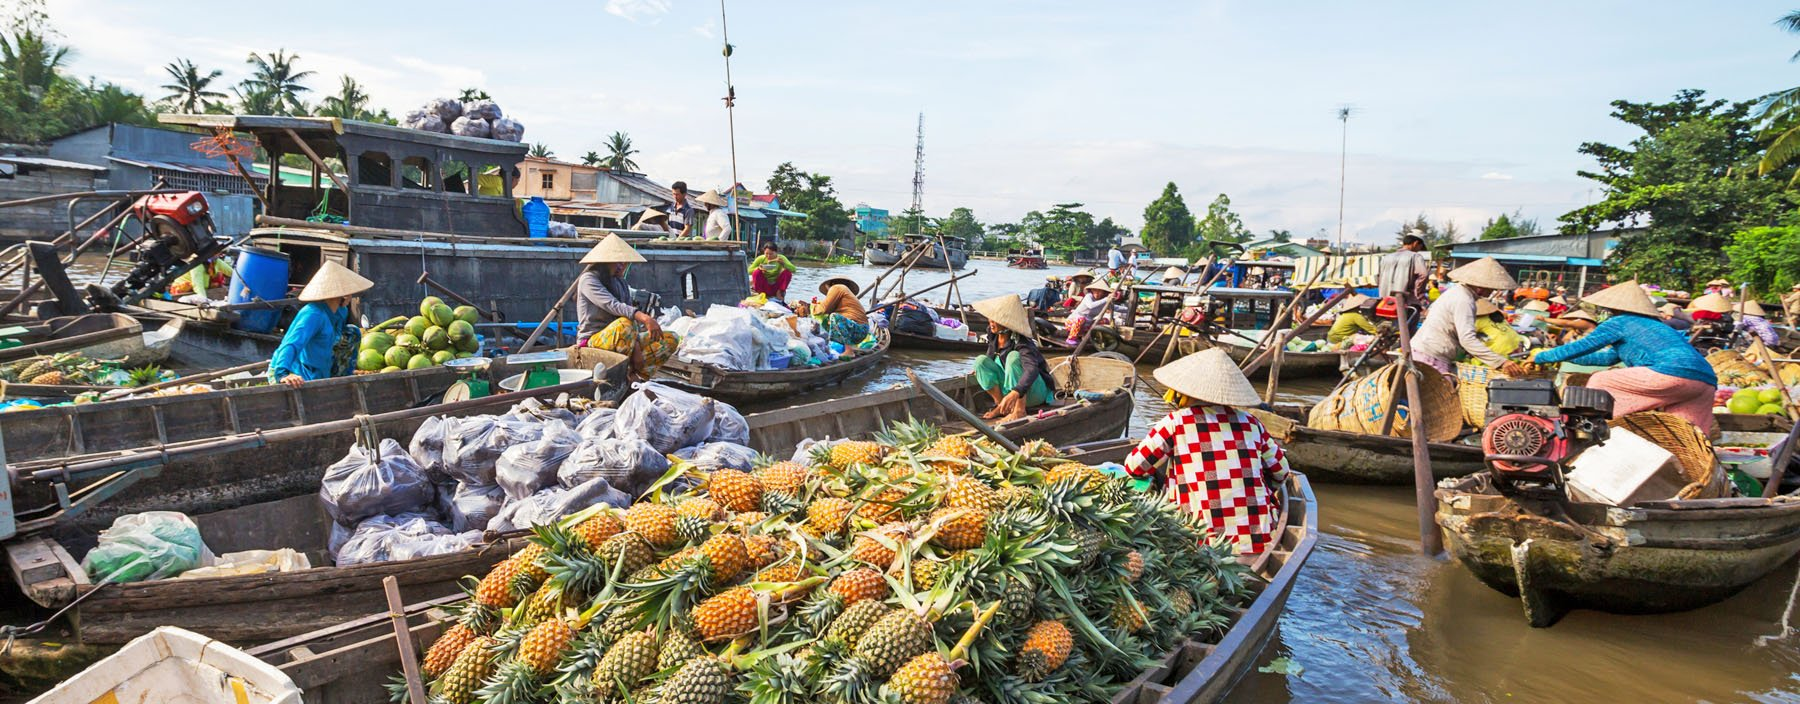 vn, mekong delta, floating market (22).jpg